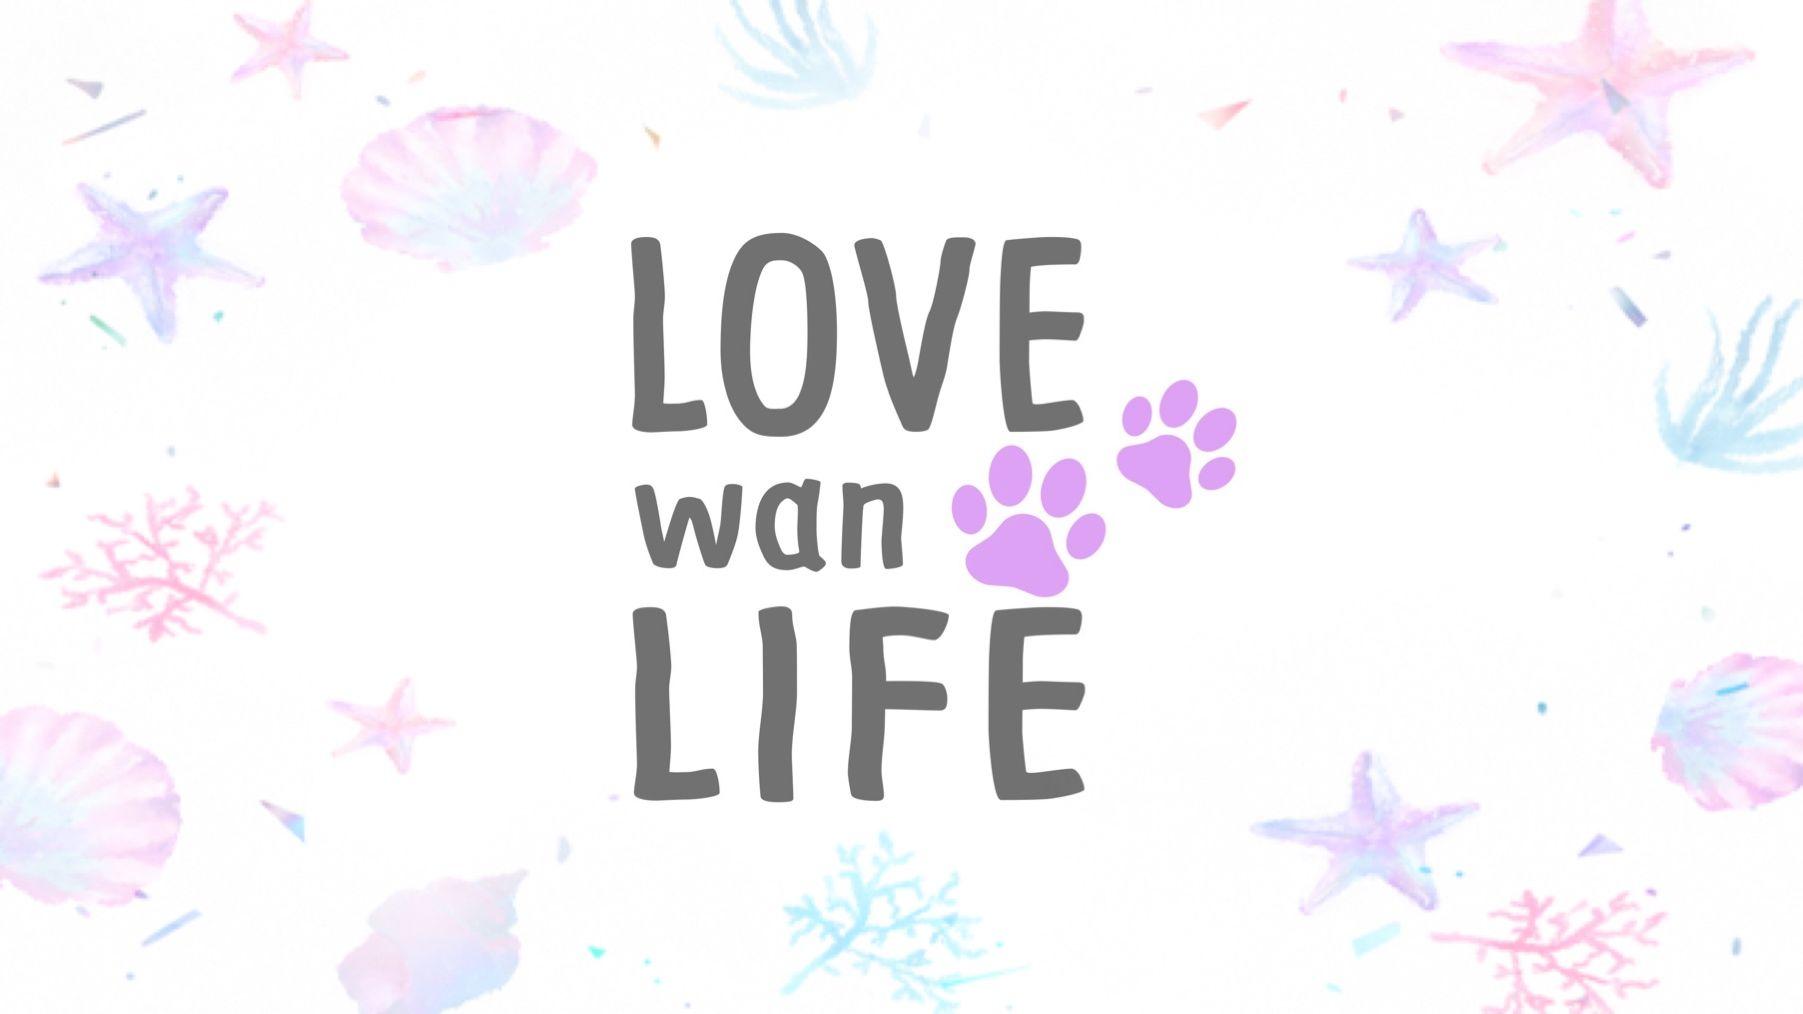 LOVE wan LIFE